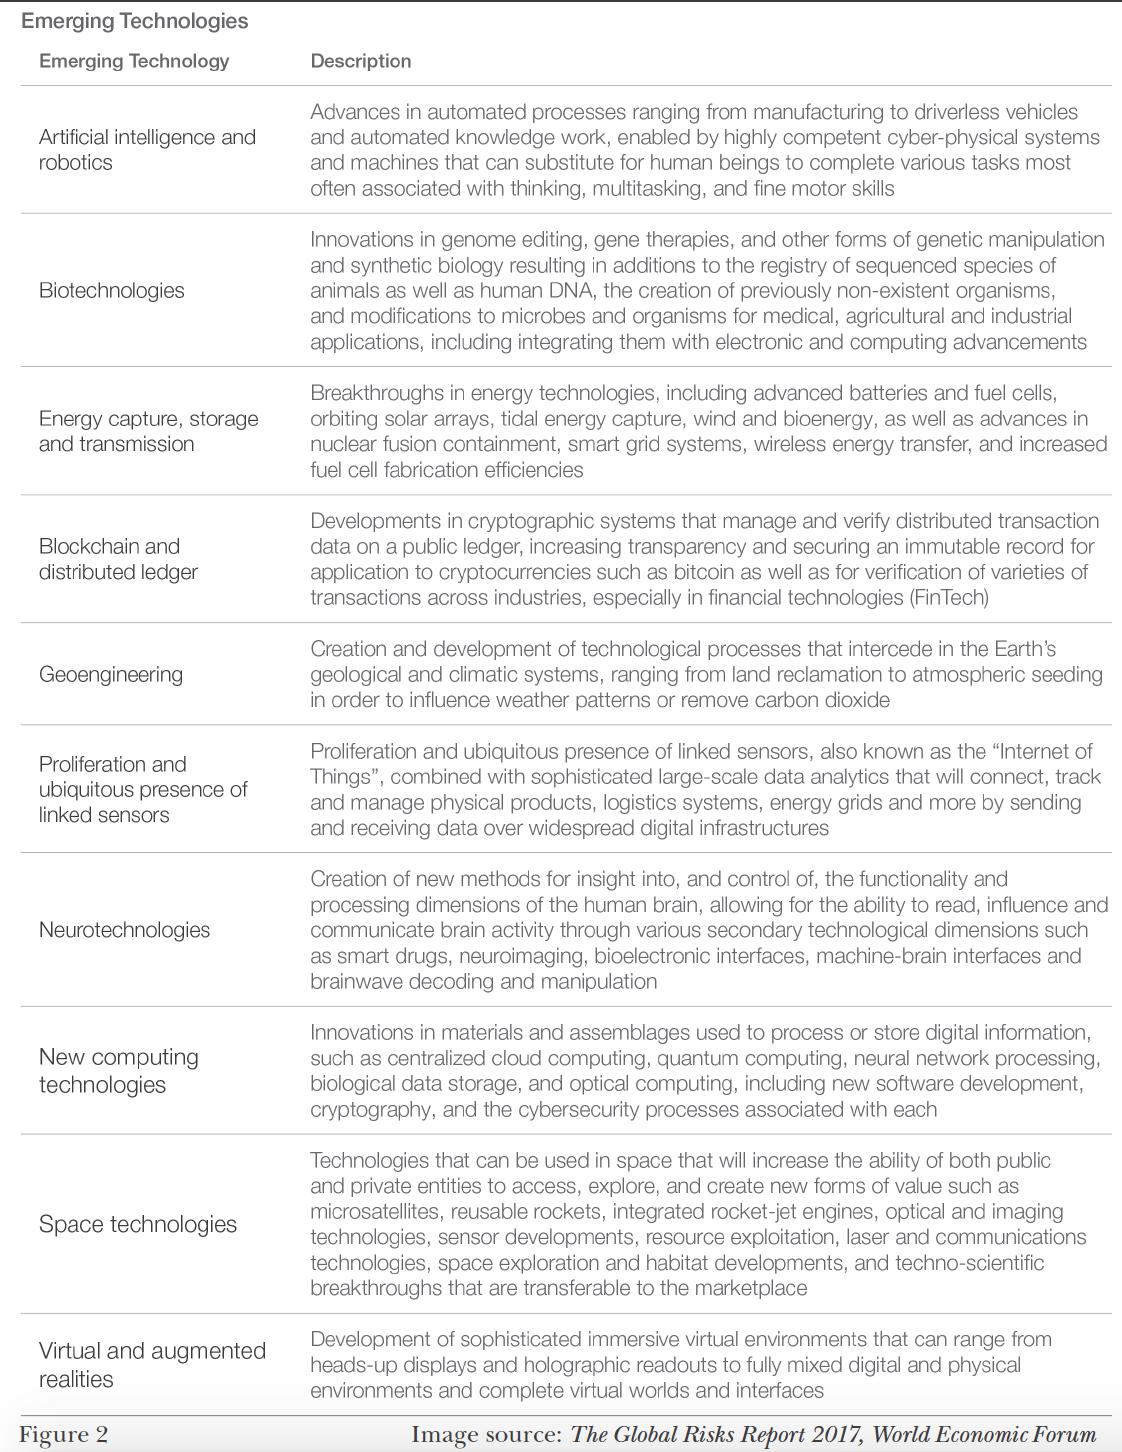 emerging-technologies.png